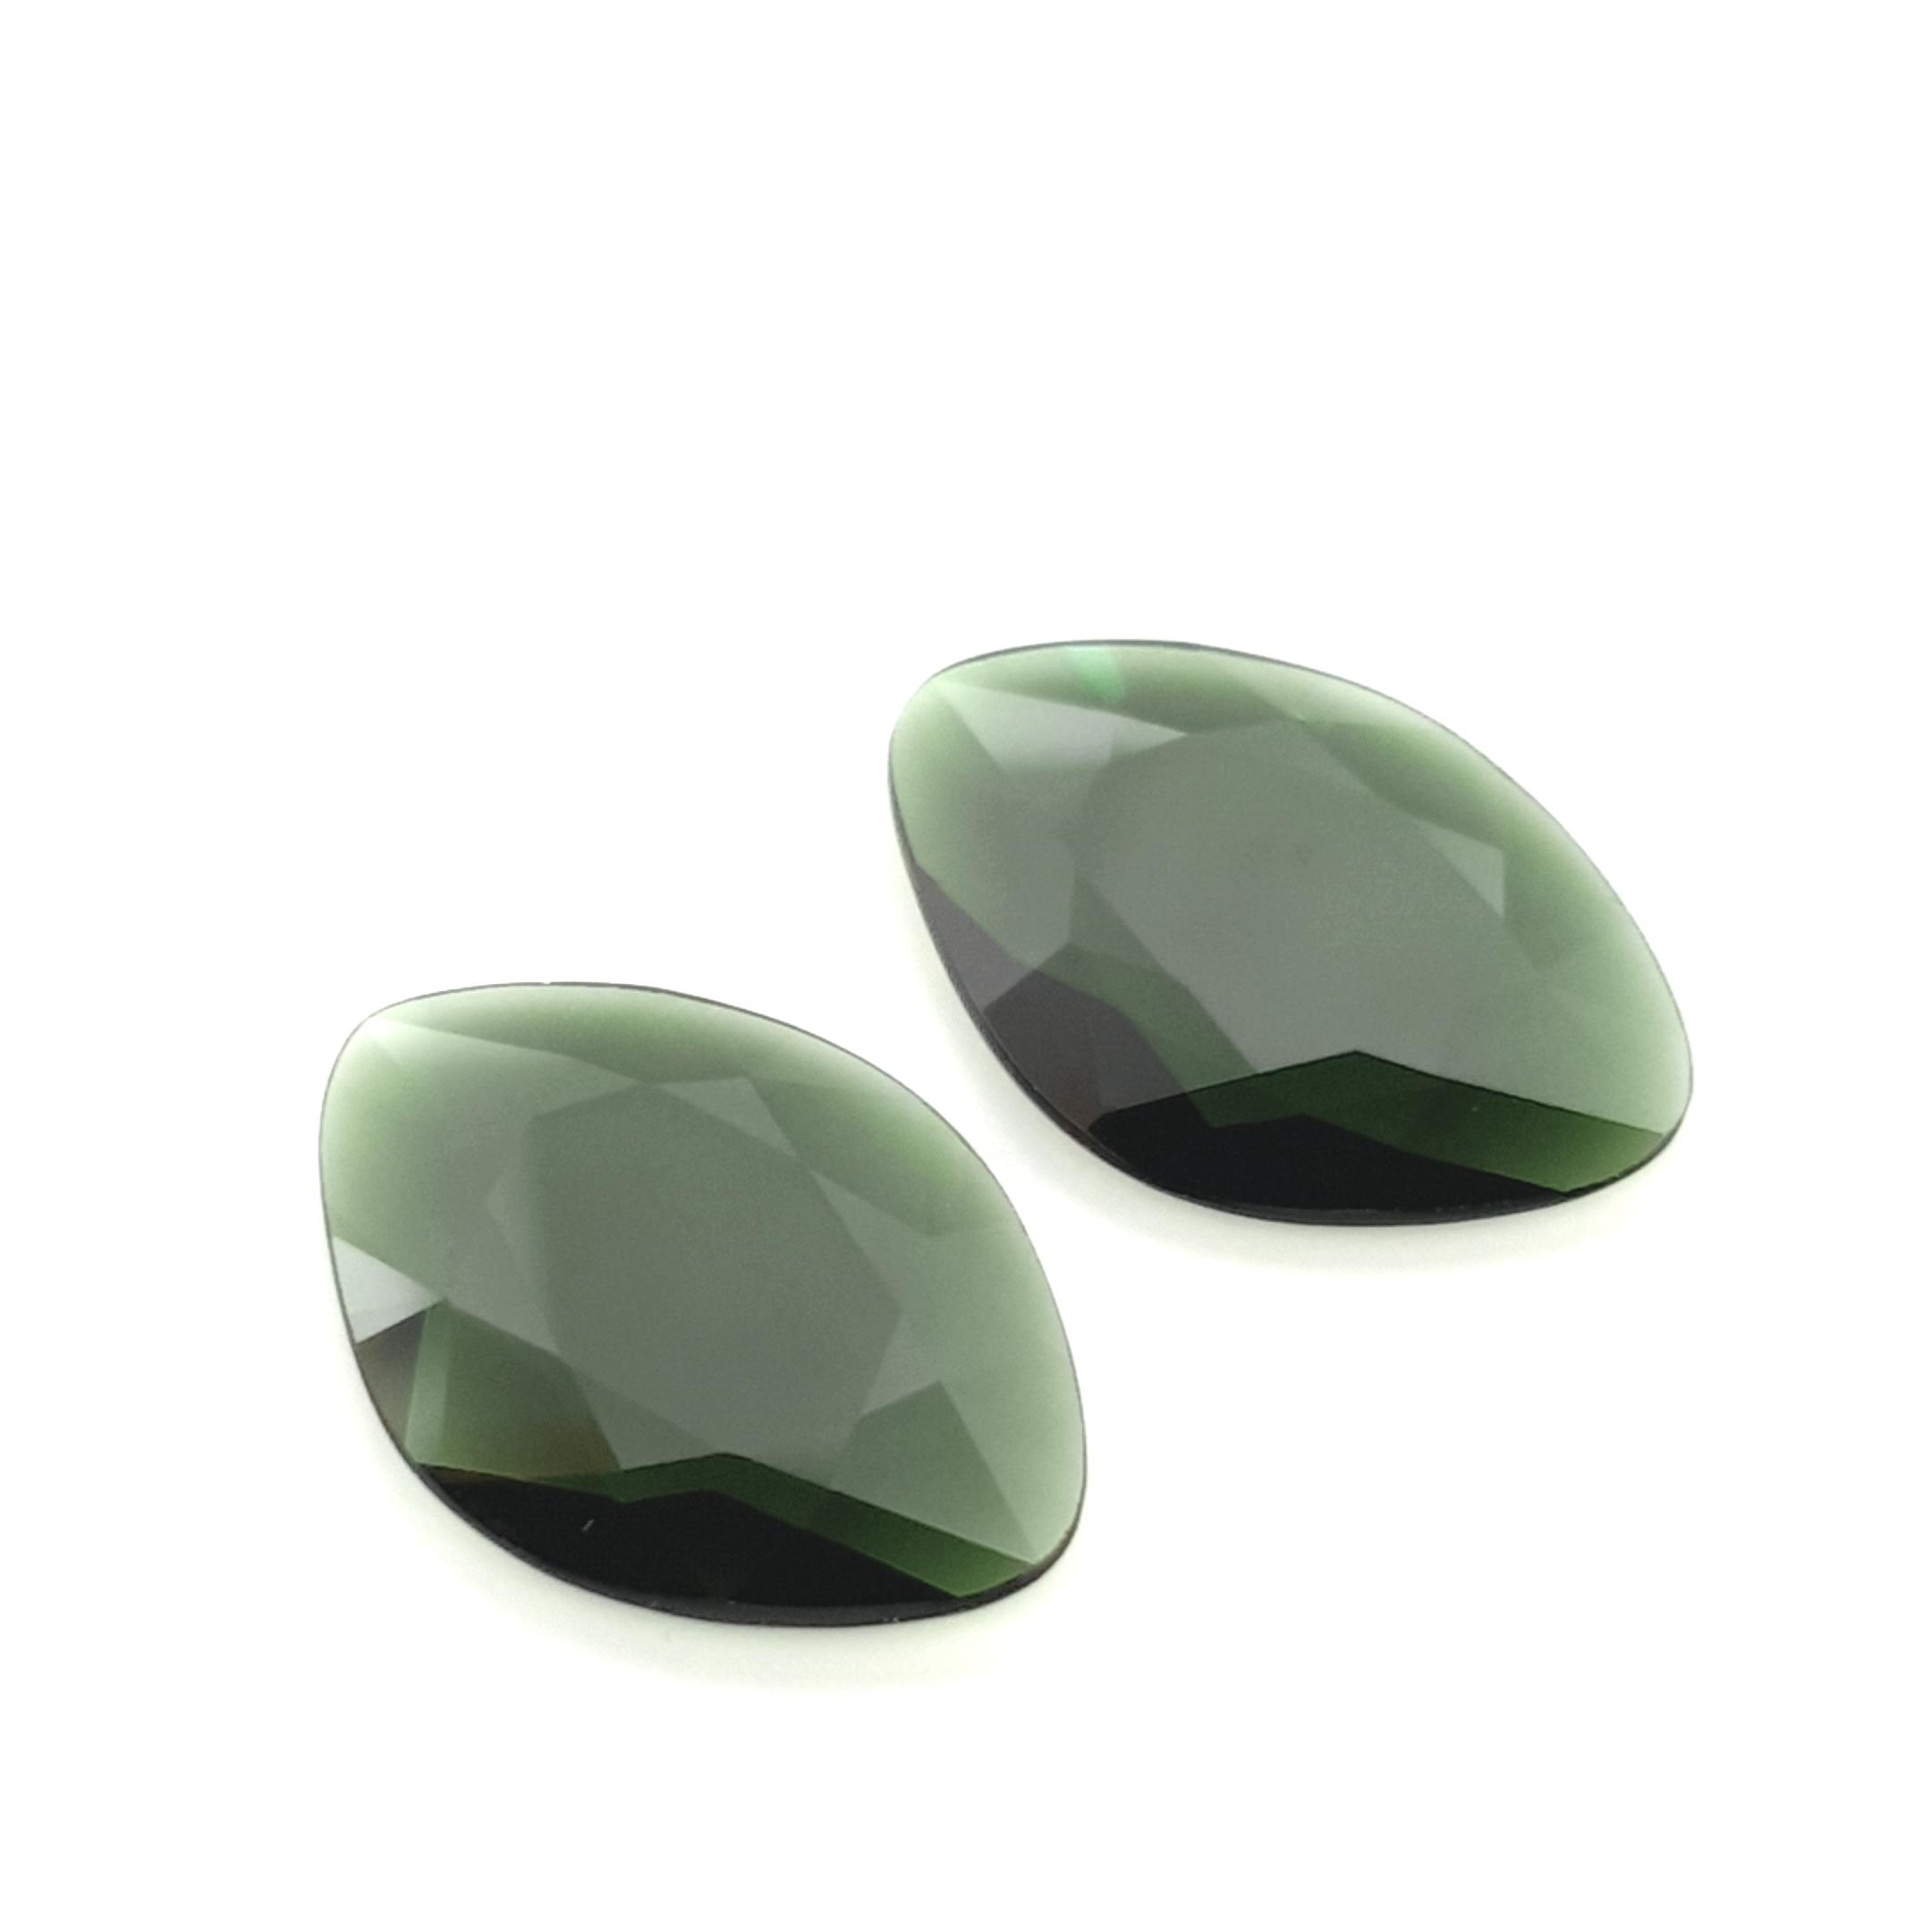 7,54ct.Pair Imperial Green Tourmalin DoubleRoseCut TMA14C31 ClaudiaHamann__2021-02-11-18-00-42